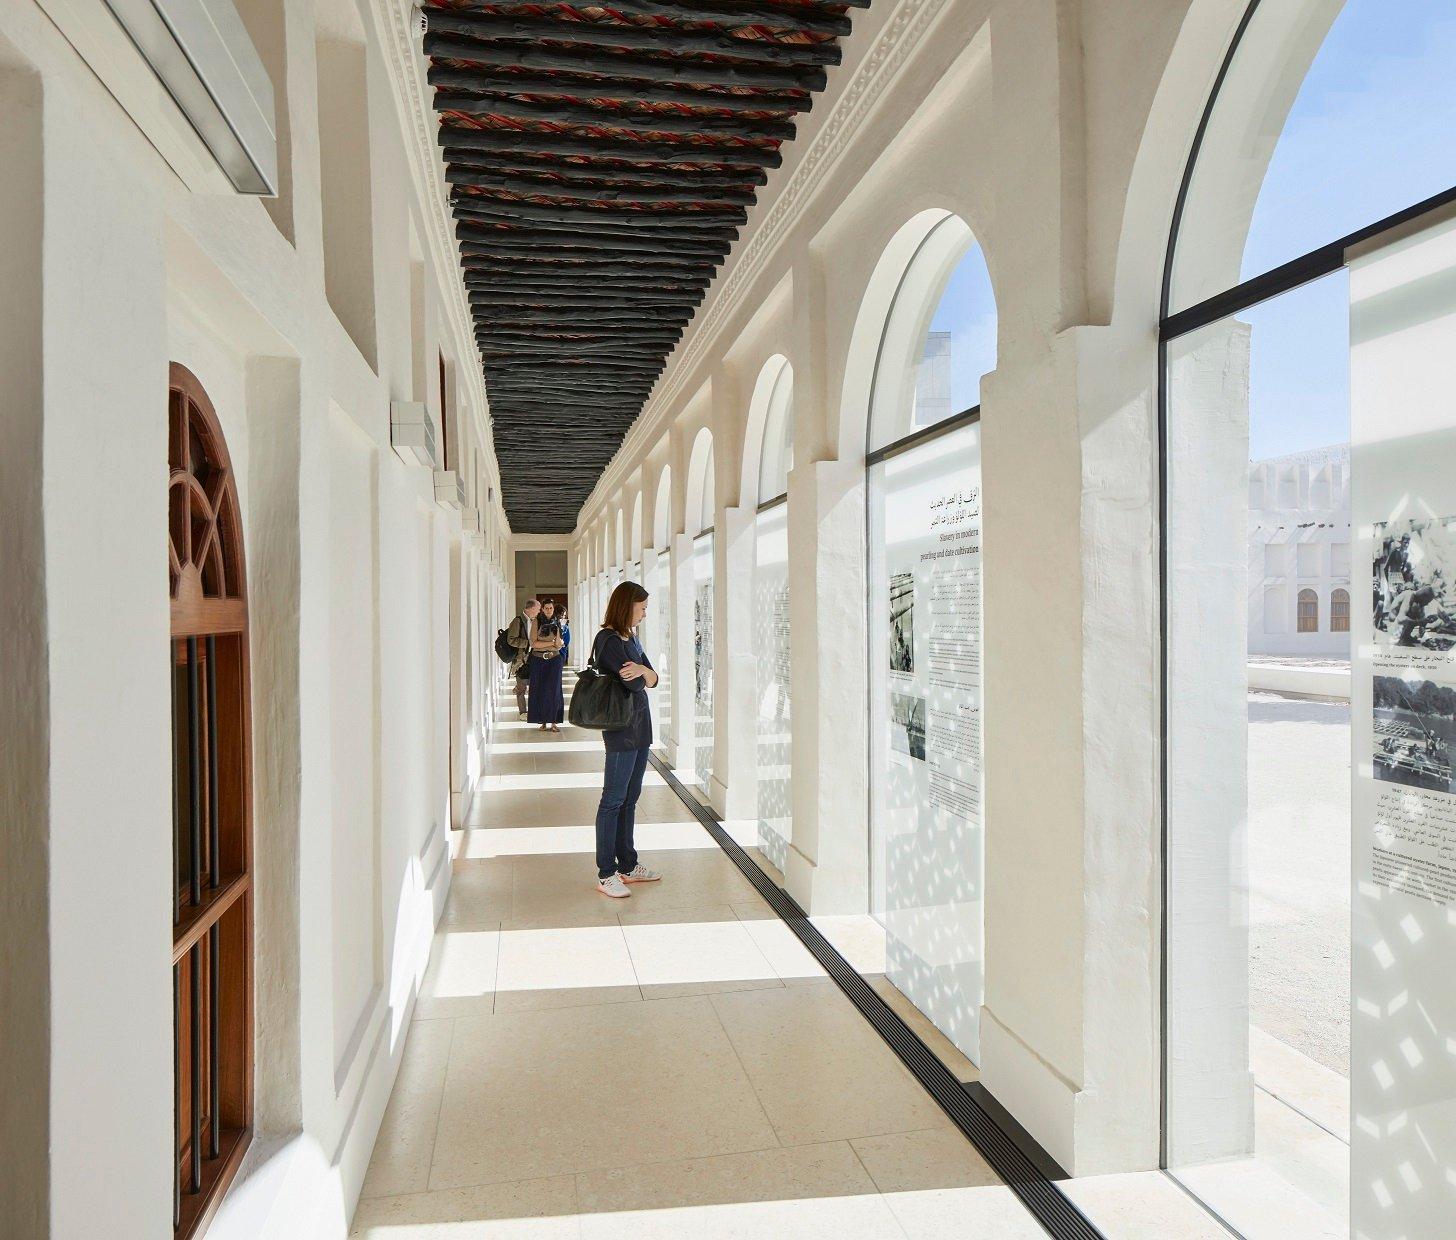 Colonnade exhibition area, Bin Jelmood House Edmund Sumner